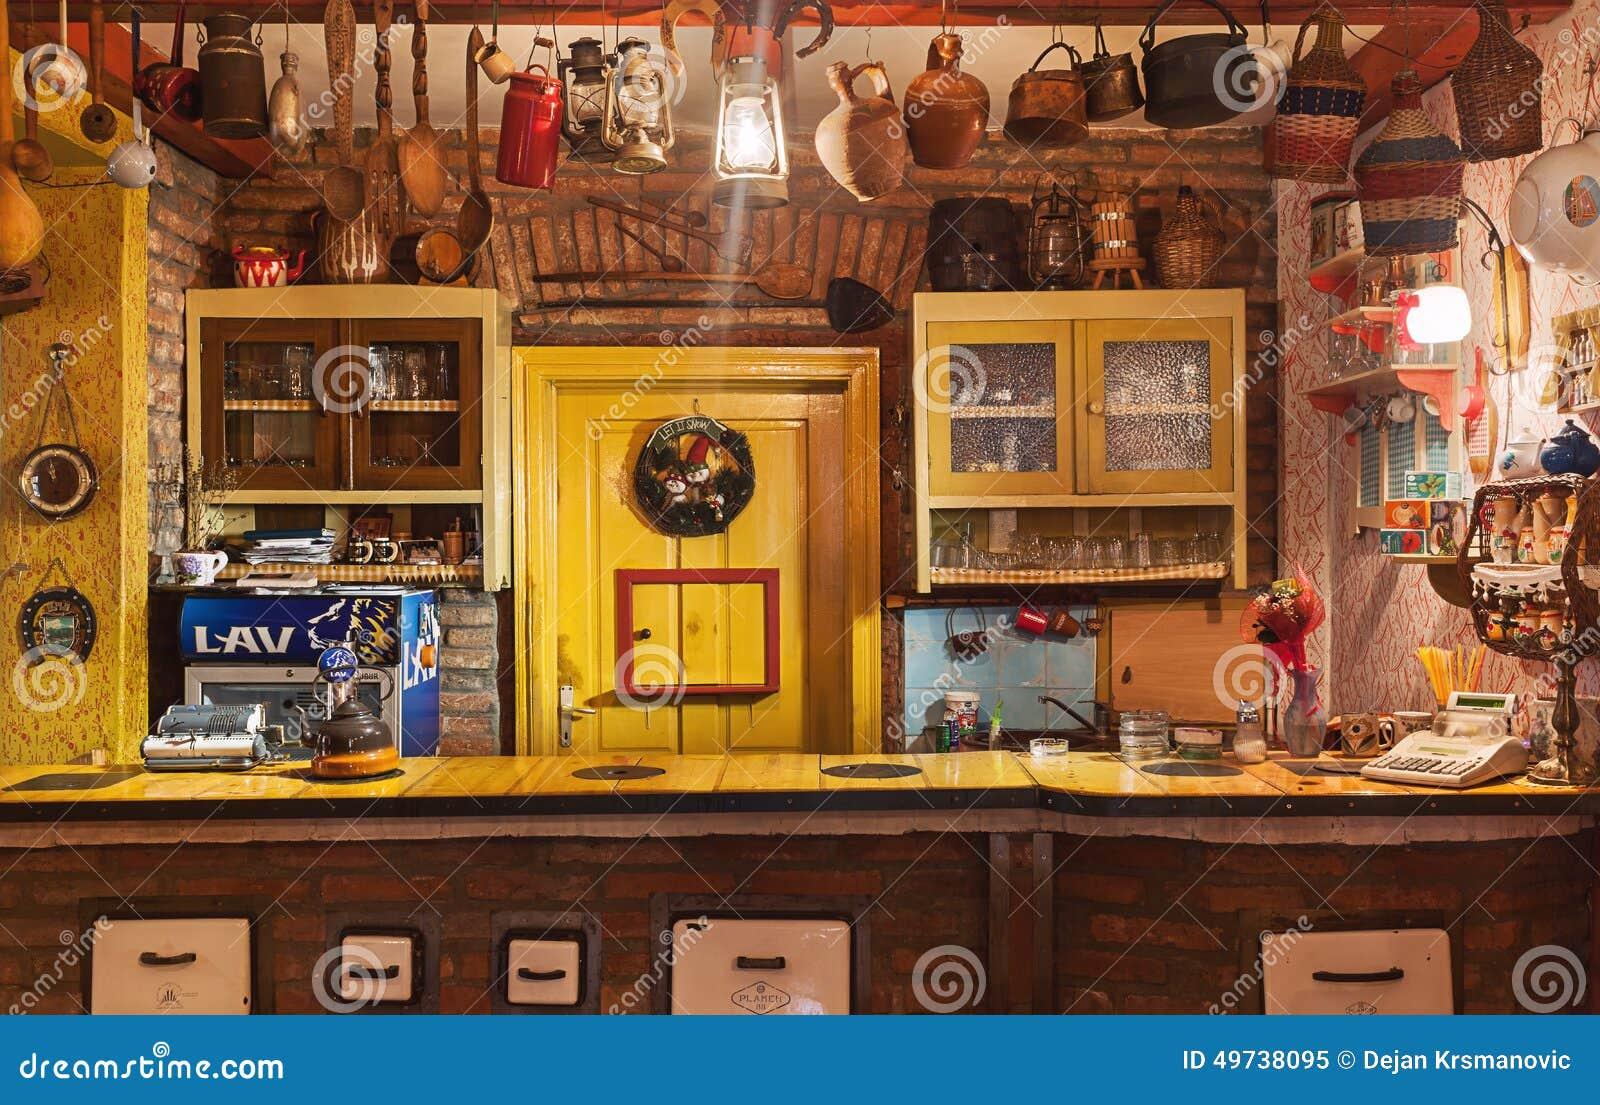 Serbian restaurant editorial image of furniture